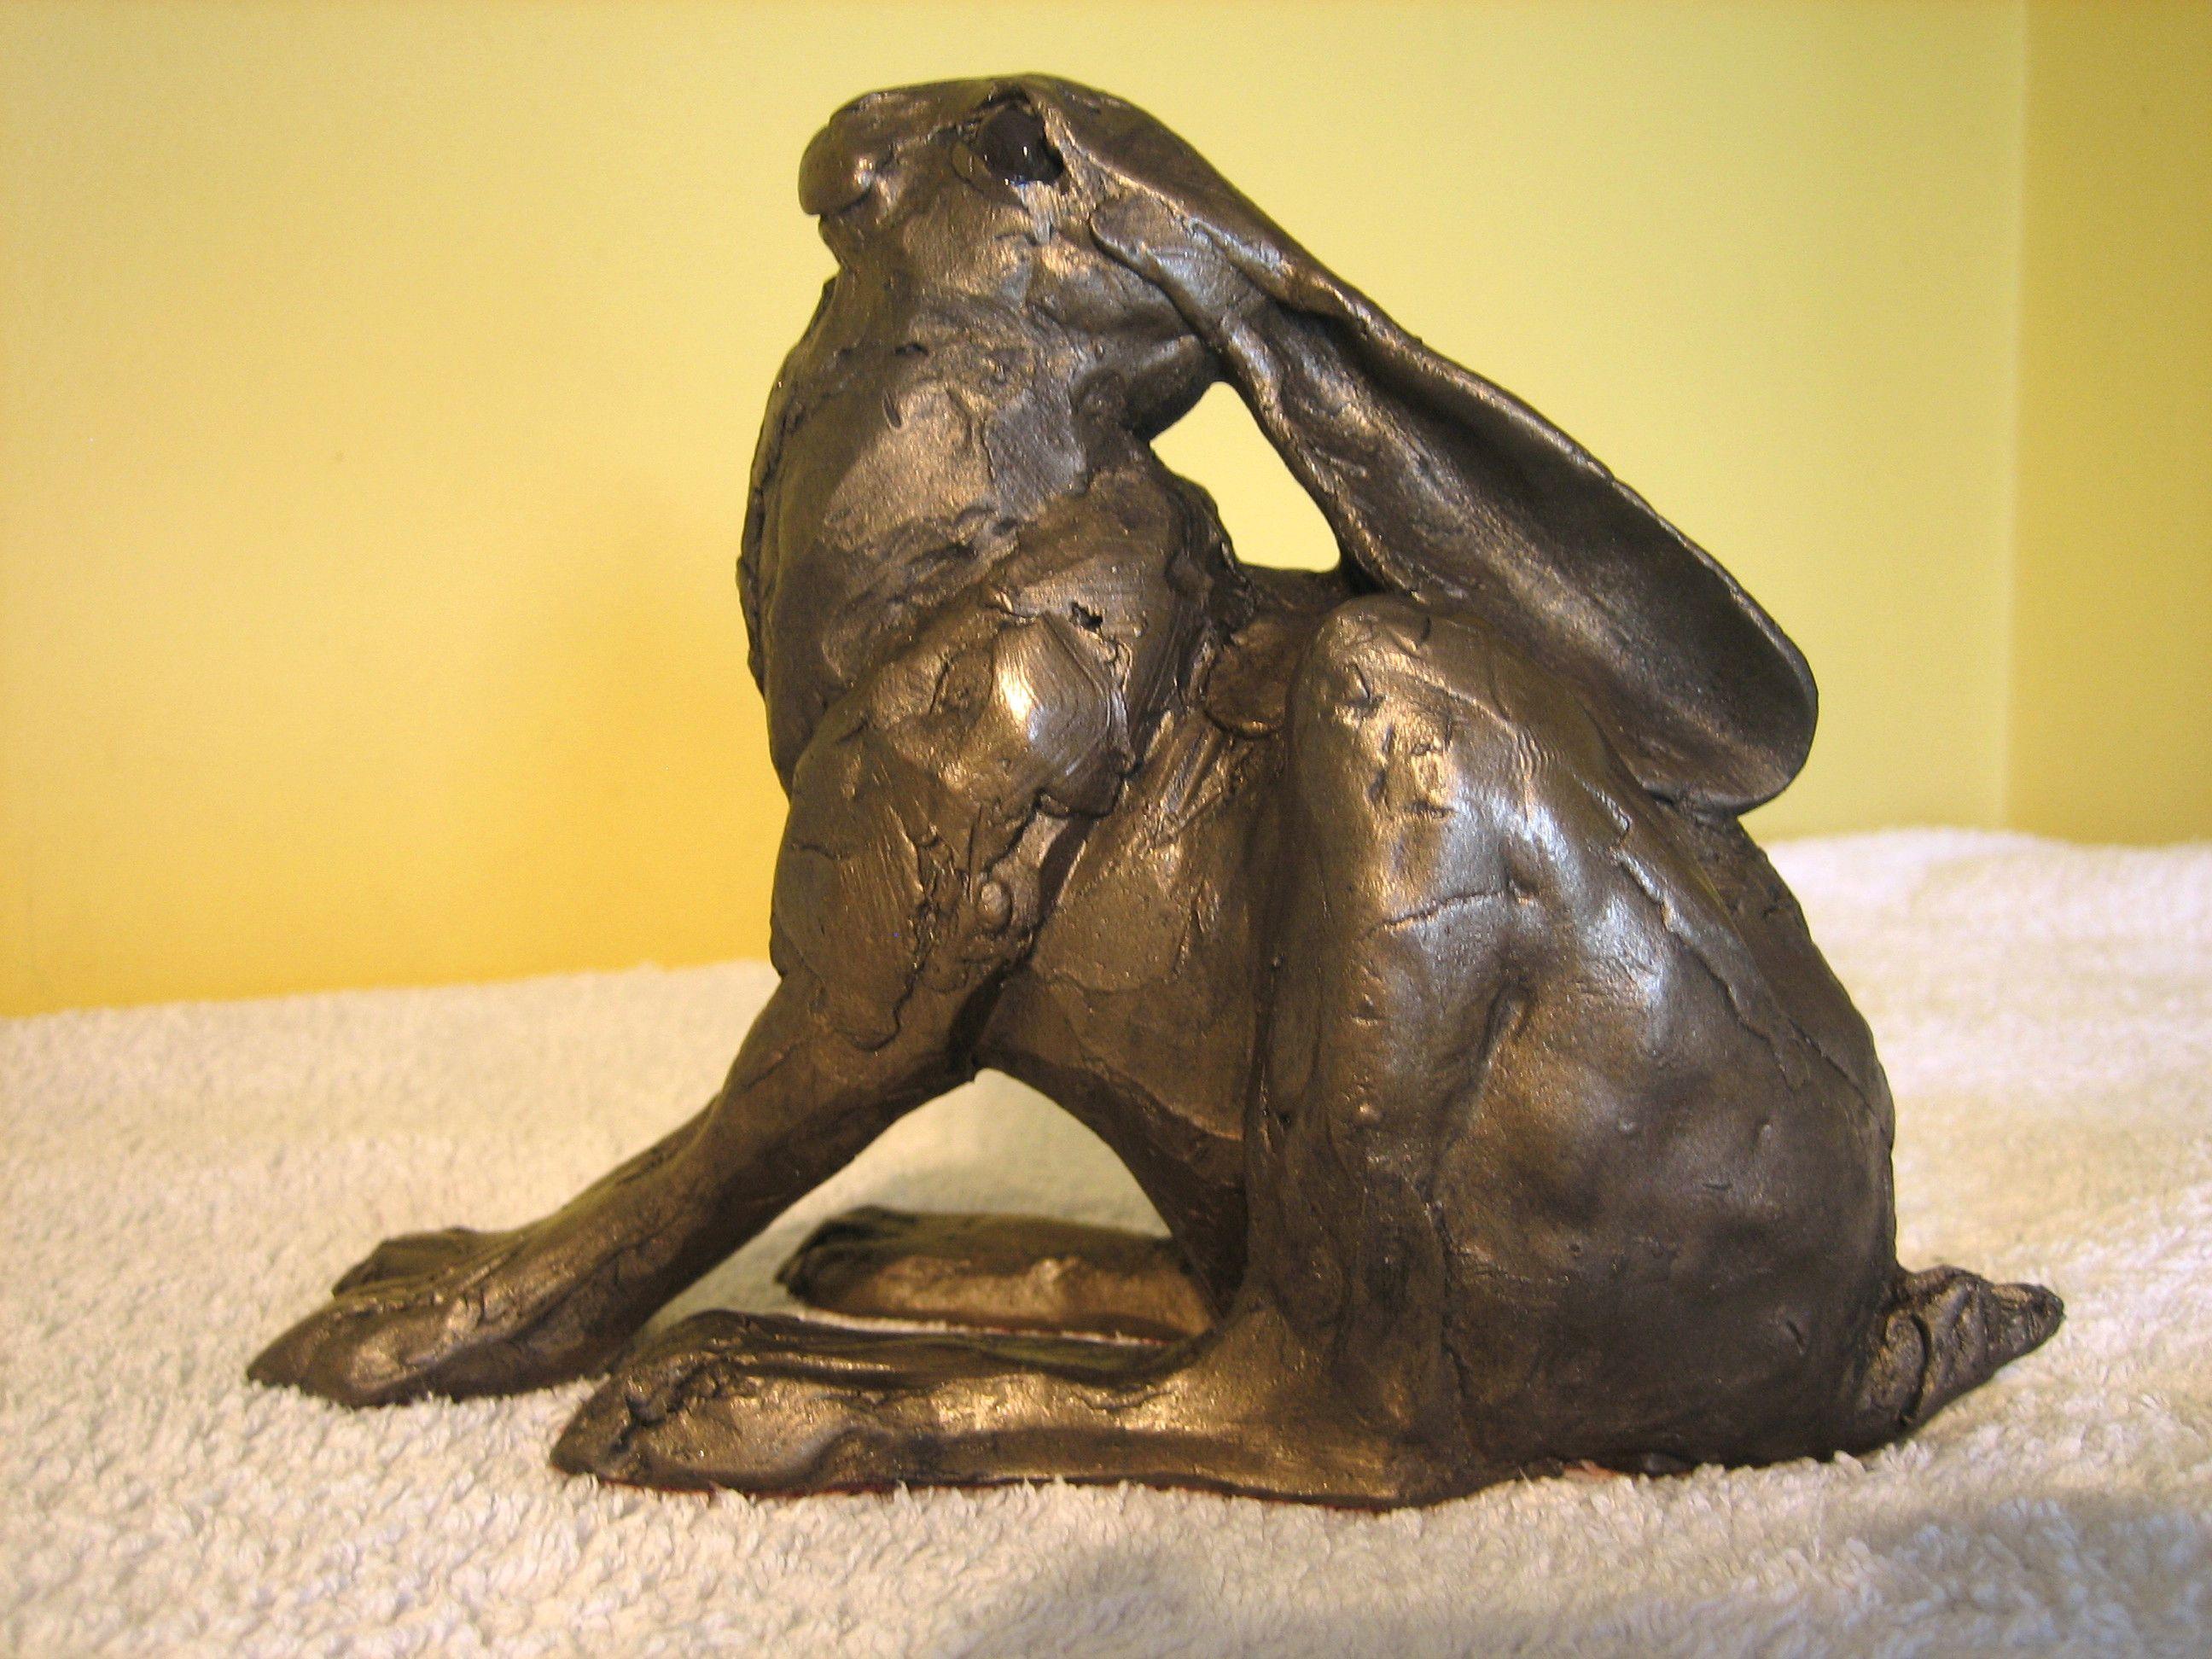 Google Image Result for http://www.bronzeharesculptures.com/images/Heather_hare.jpg